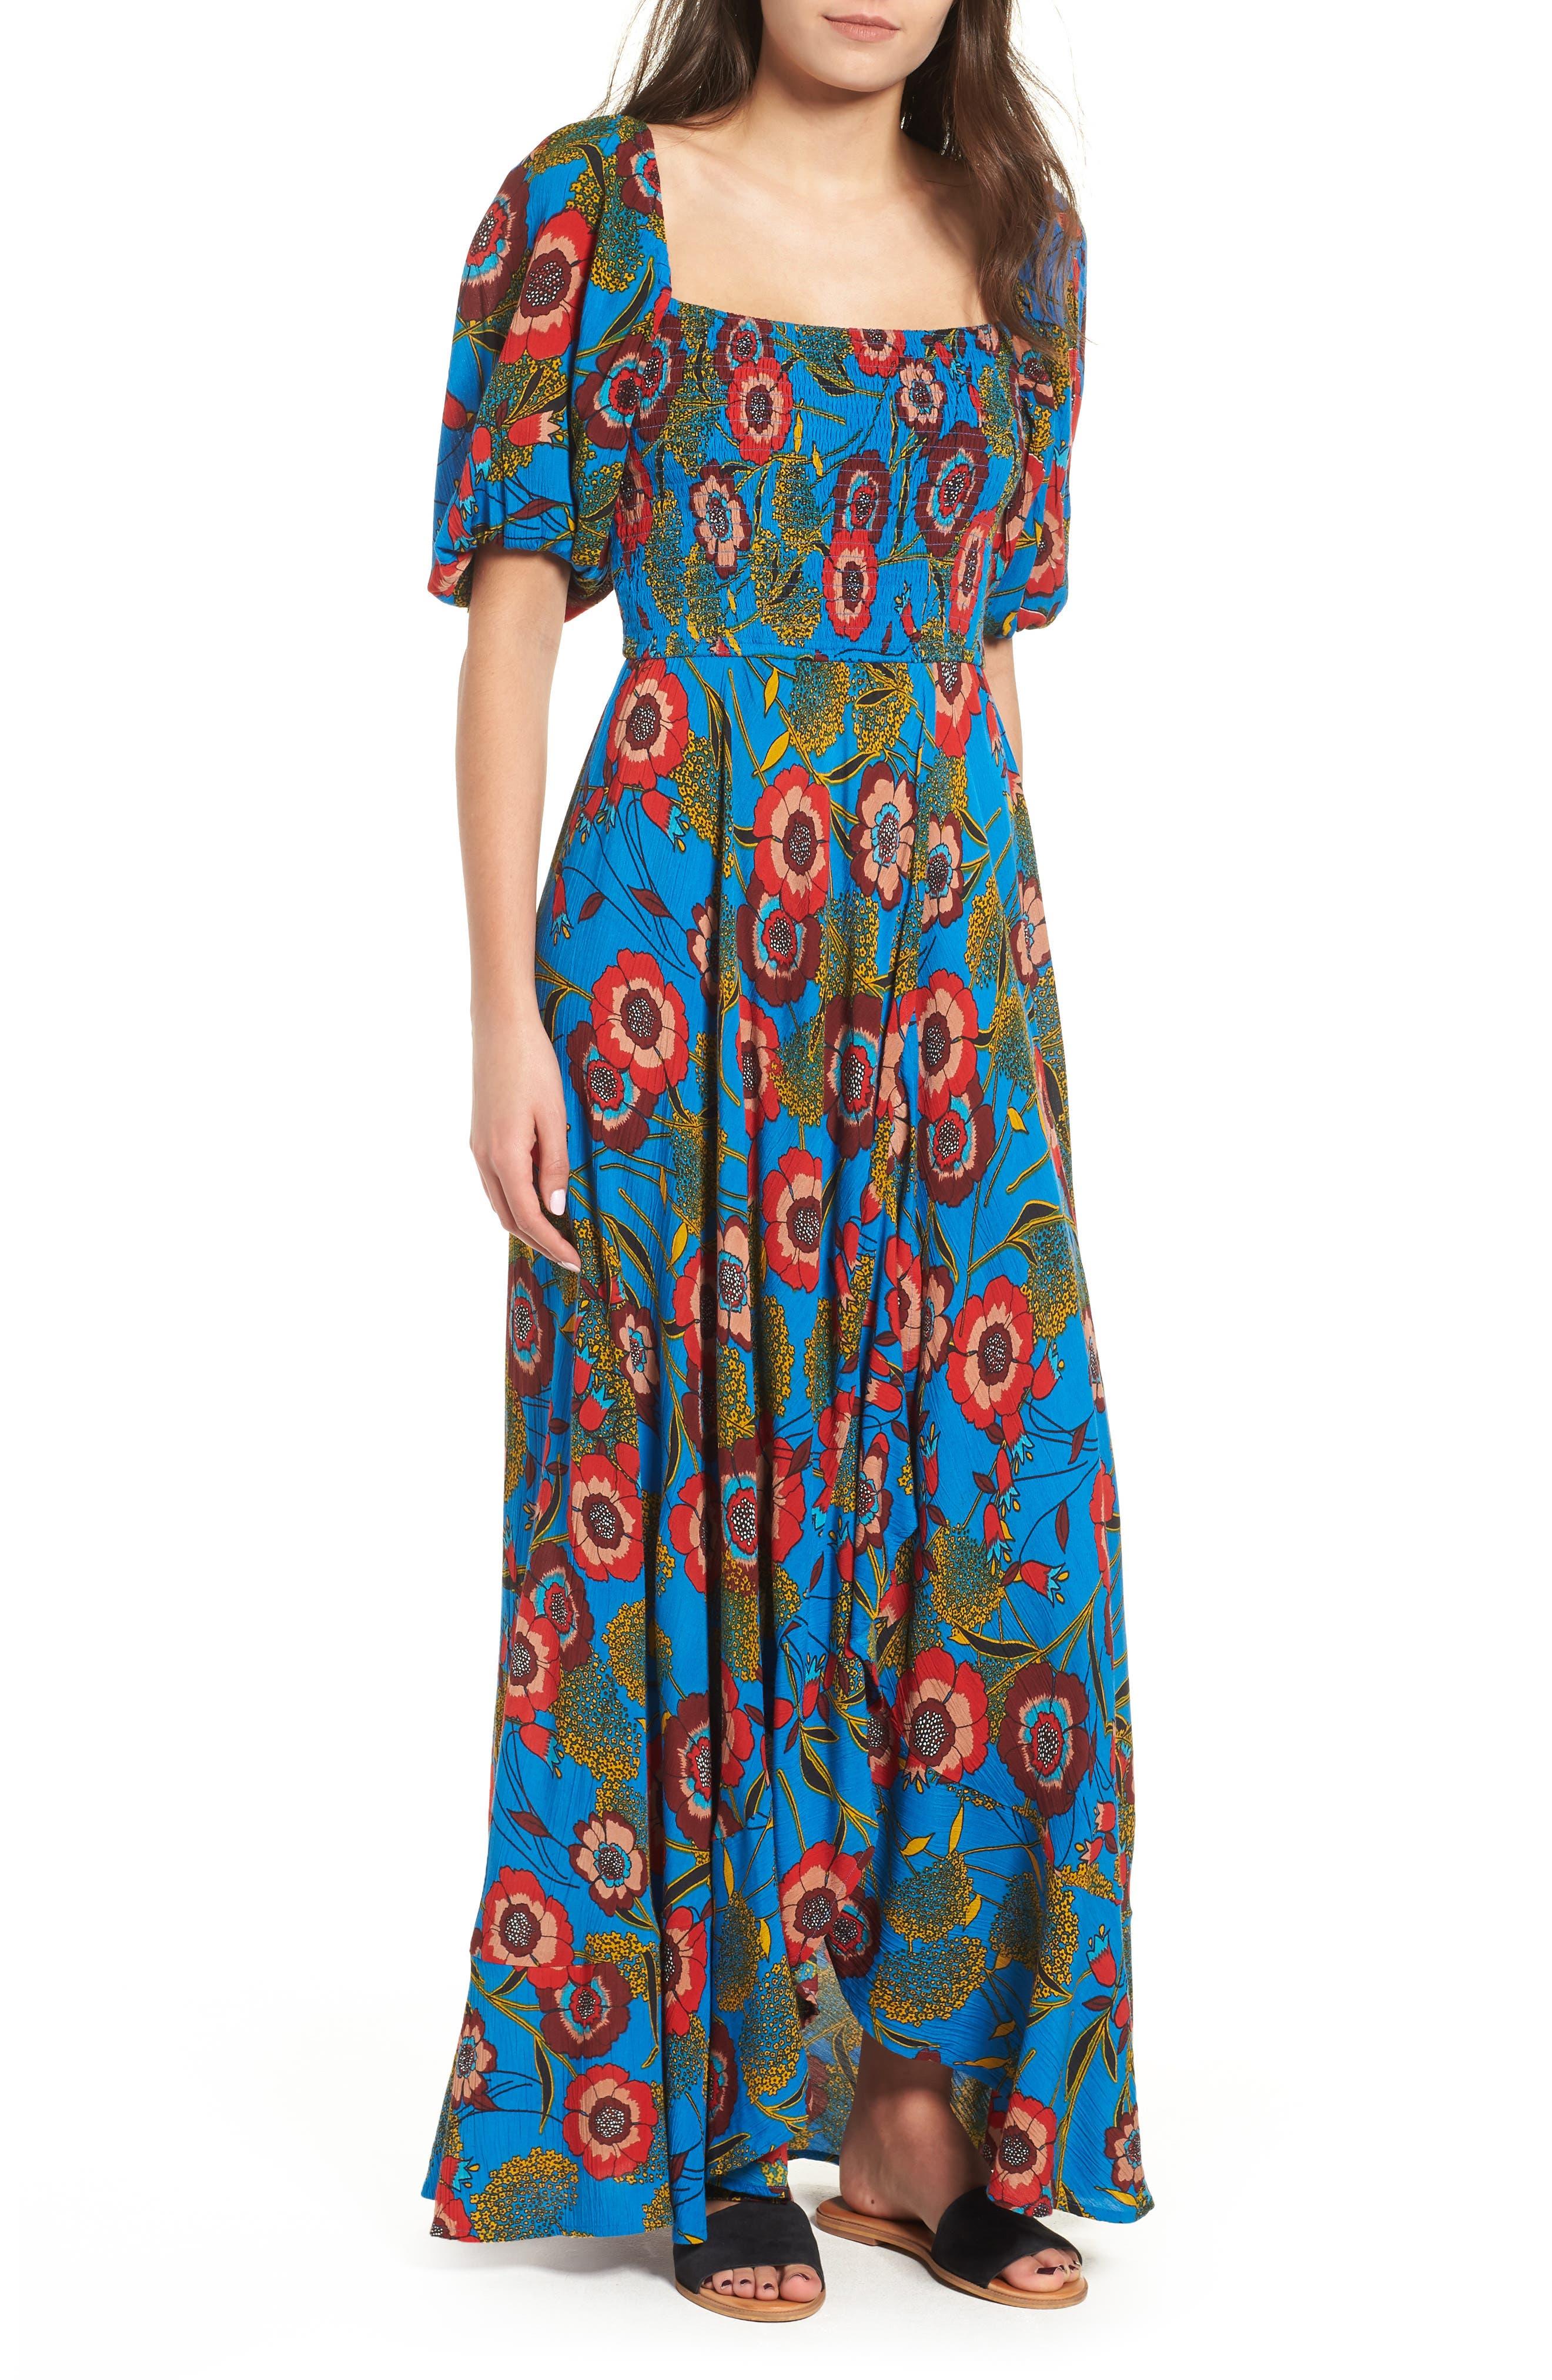 Band of Gypsies Heirloom Blossom Maxi Dress